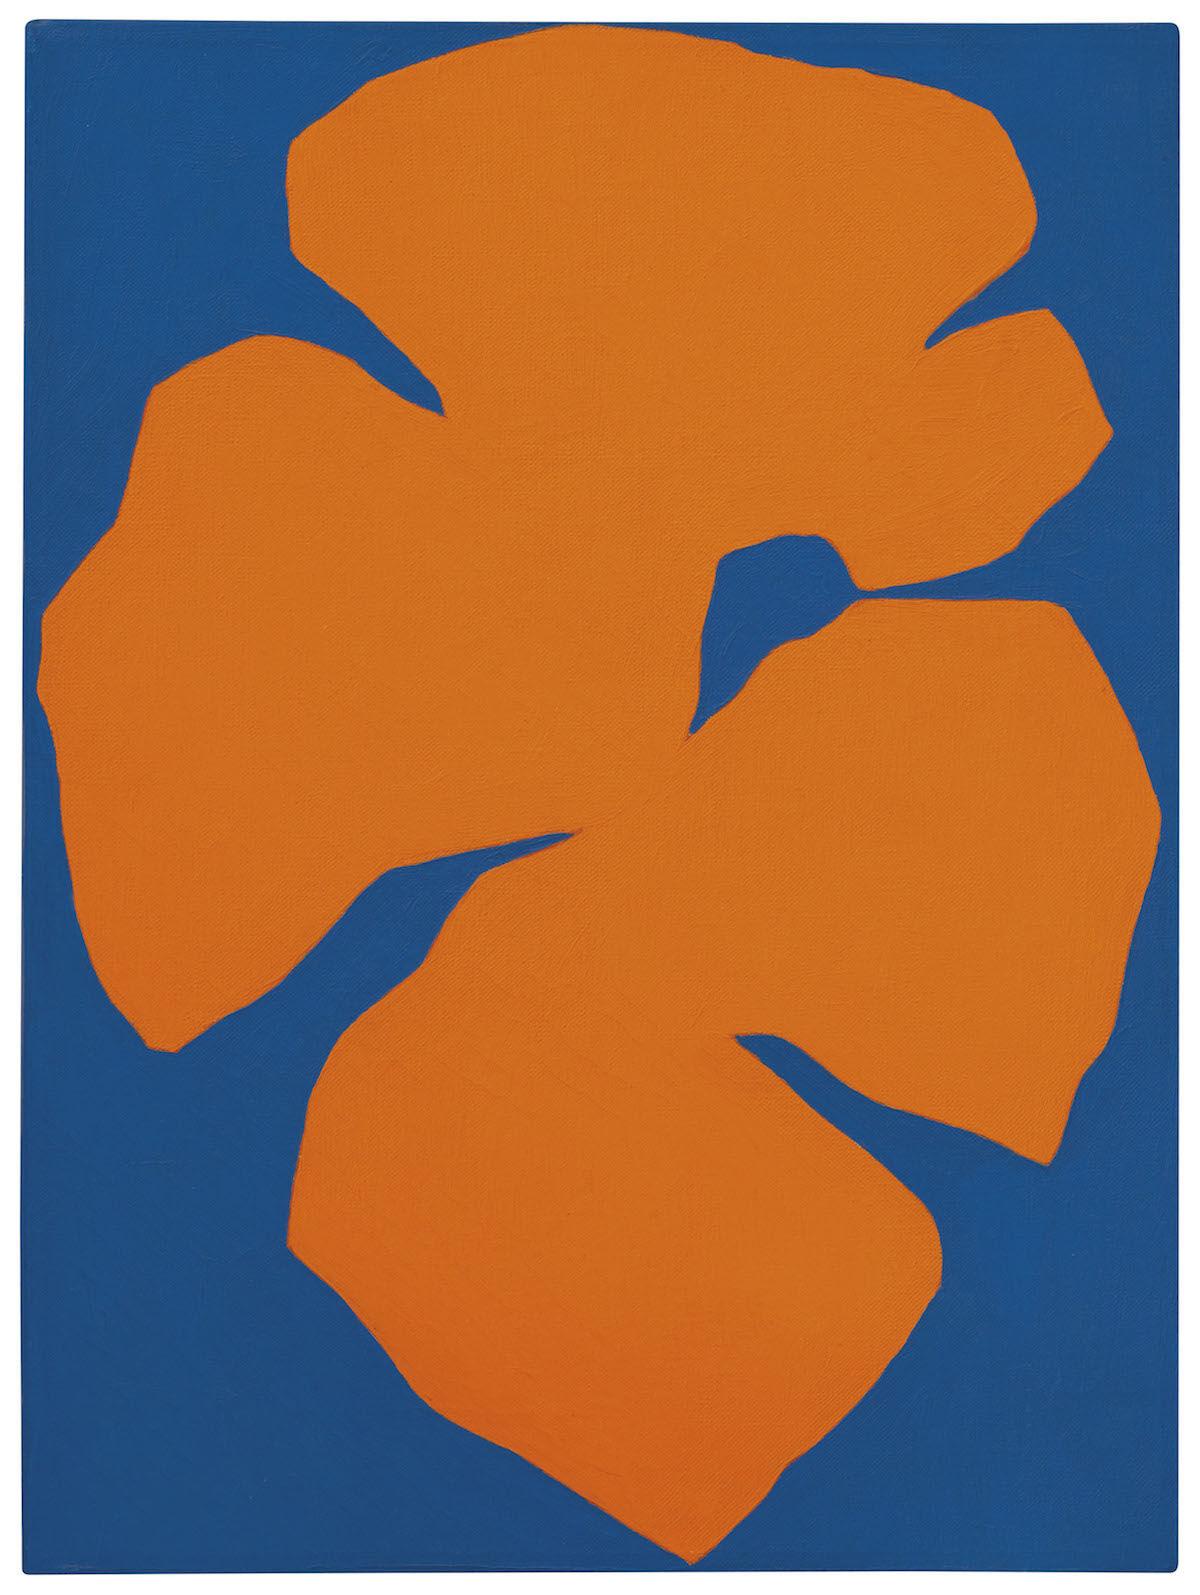 Ellsworth Kelly, Orange Blue, 1957. Est. $900,000–1,200,000. Courtesy Christie's Images Ltd.